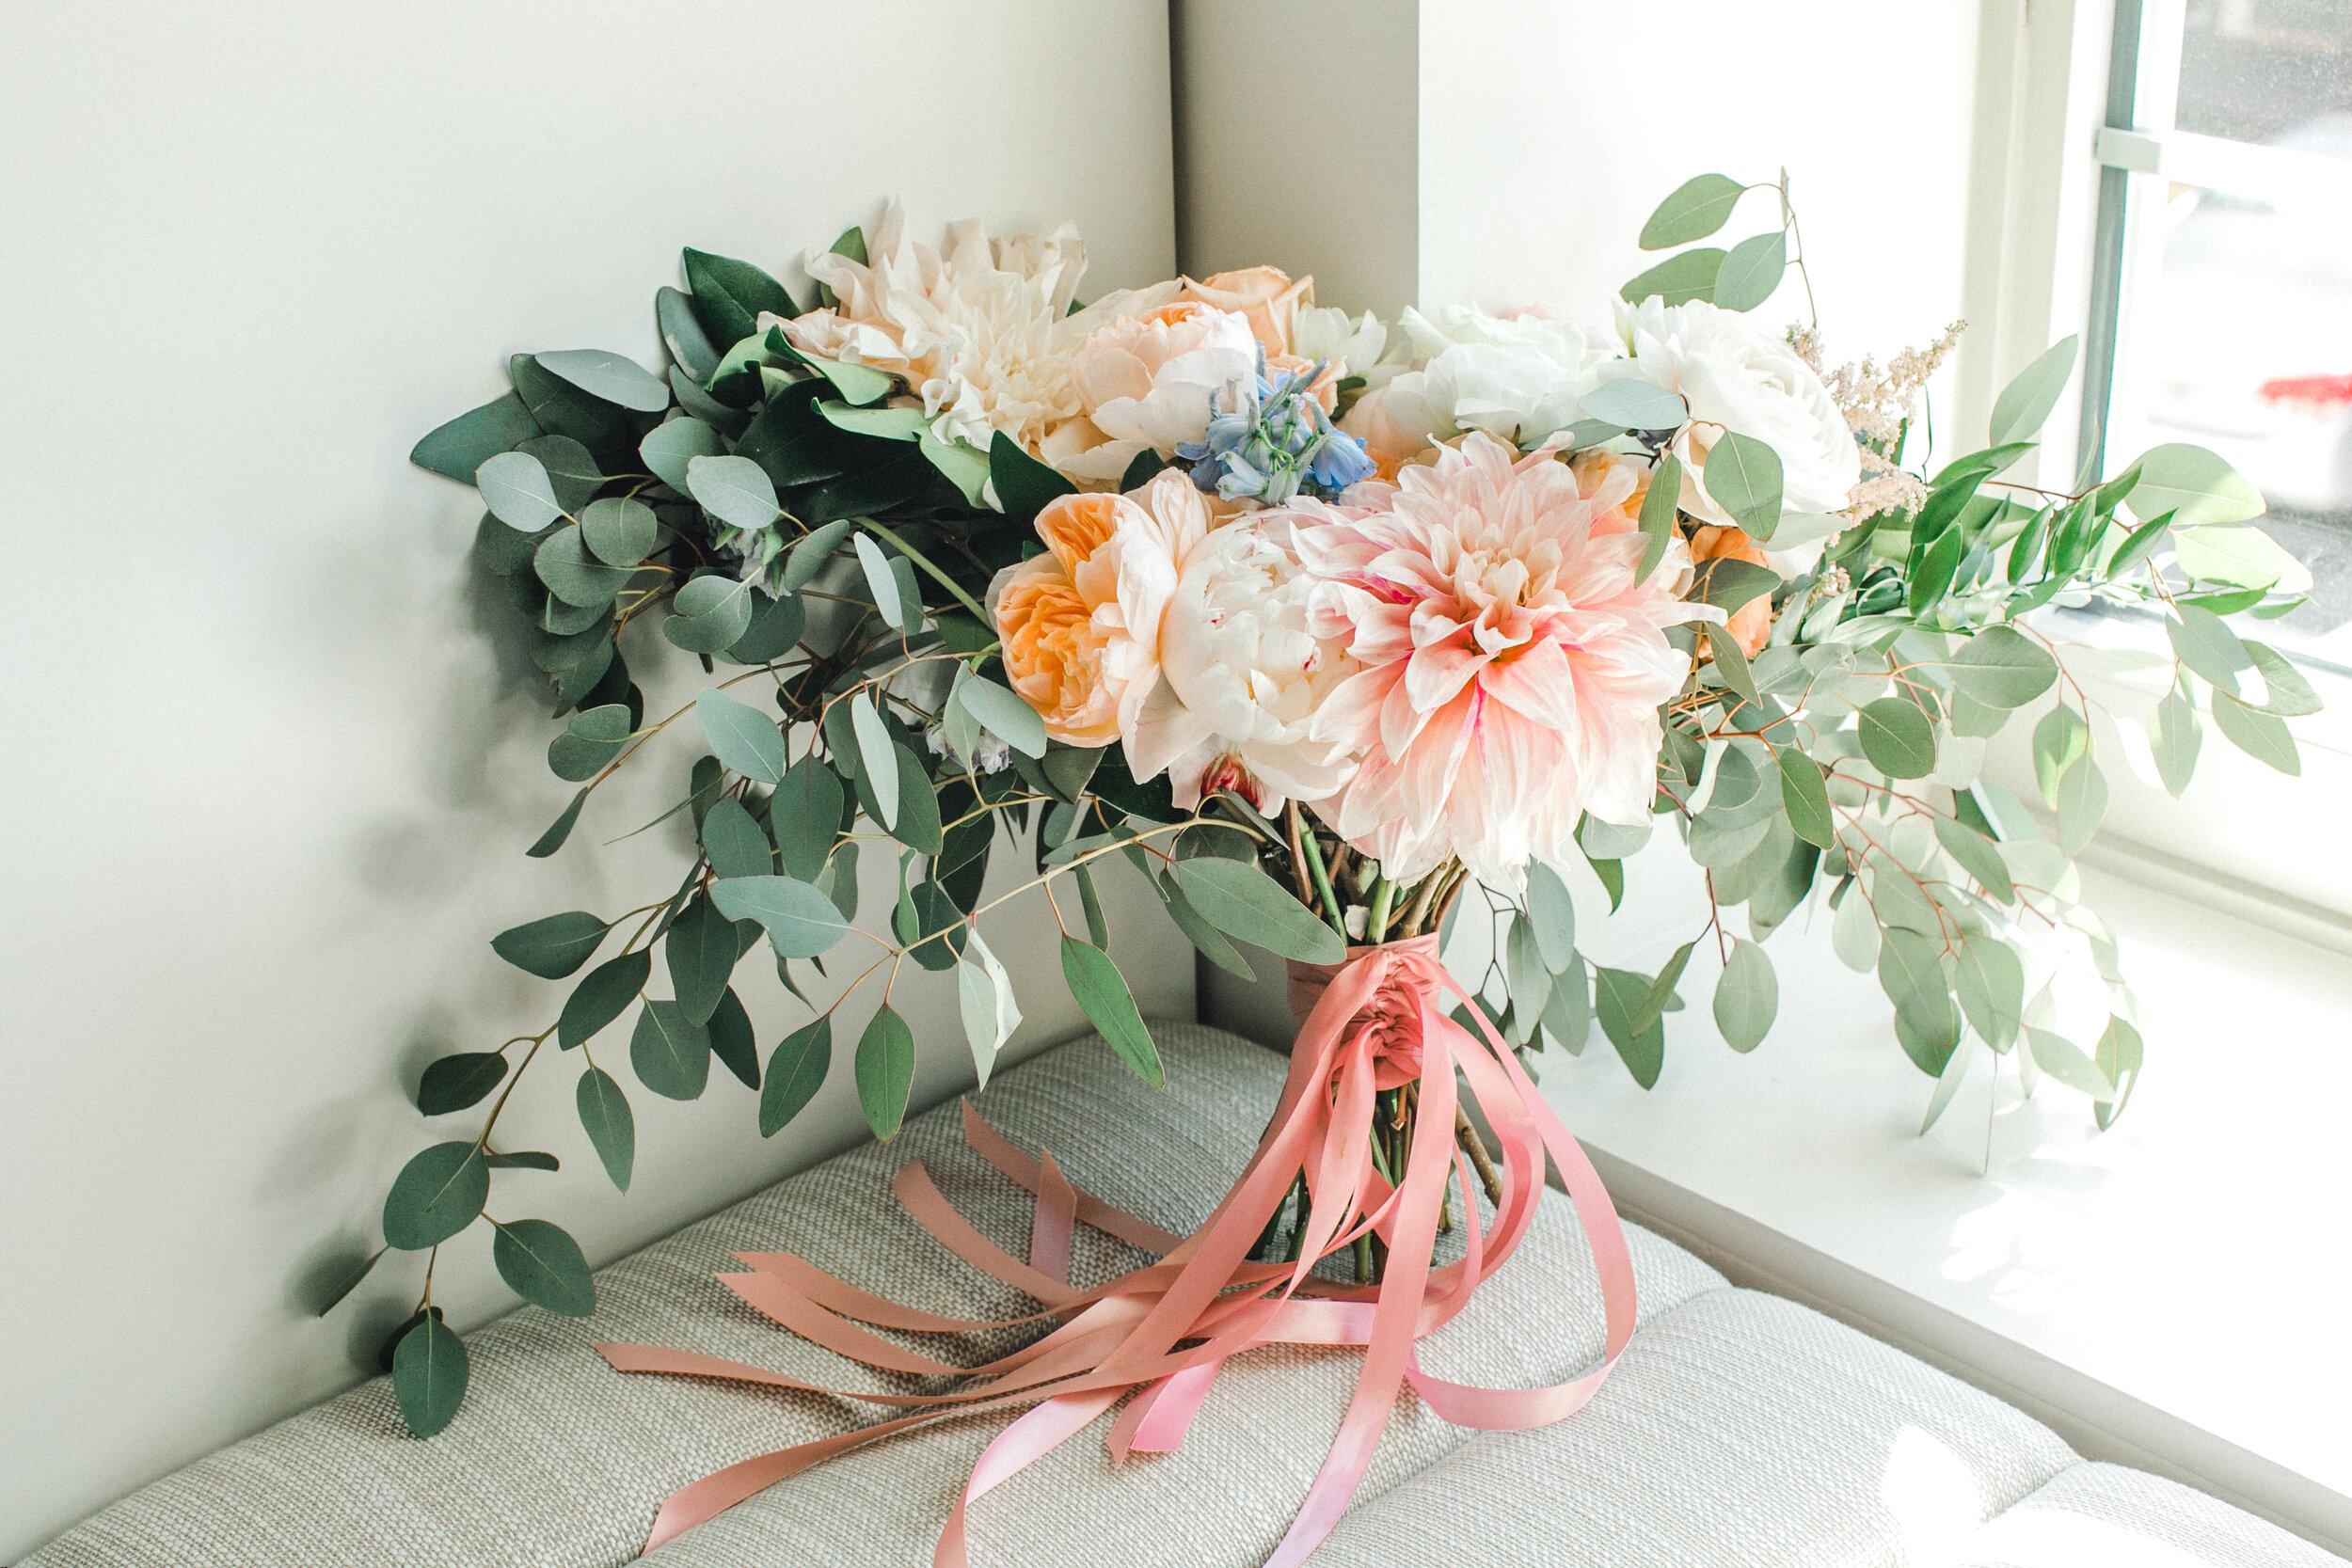 ivory-and-beau-blog-weddings-ivory-and-beau-couple-dominique-and-andres-savannah-florist-wedding-planning-savannah-bridal-boutique-wedding-flowers-KIP_WEBERWEDDING_RAILROADMUSEUM-30.JPG